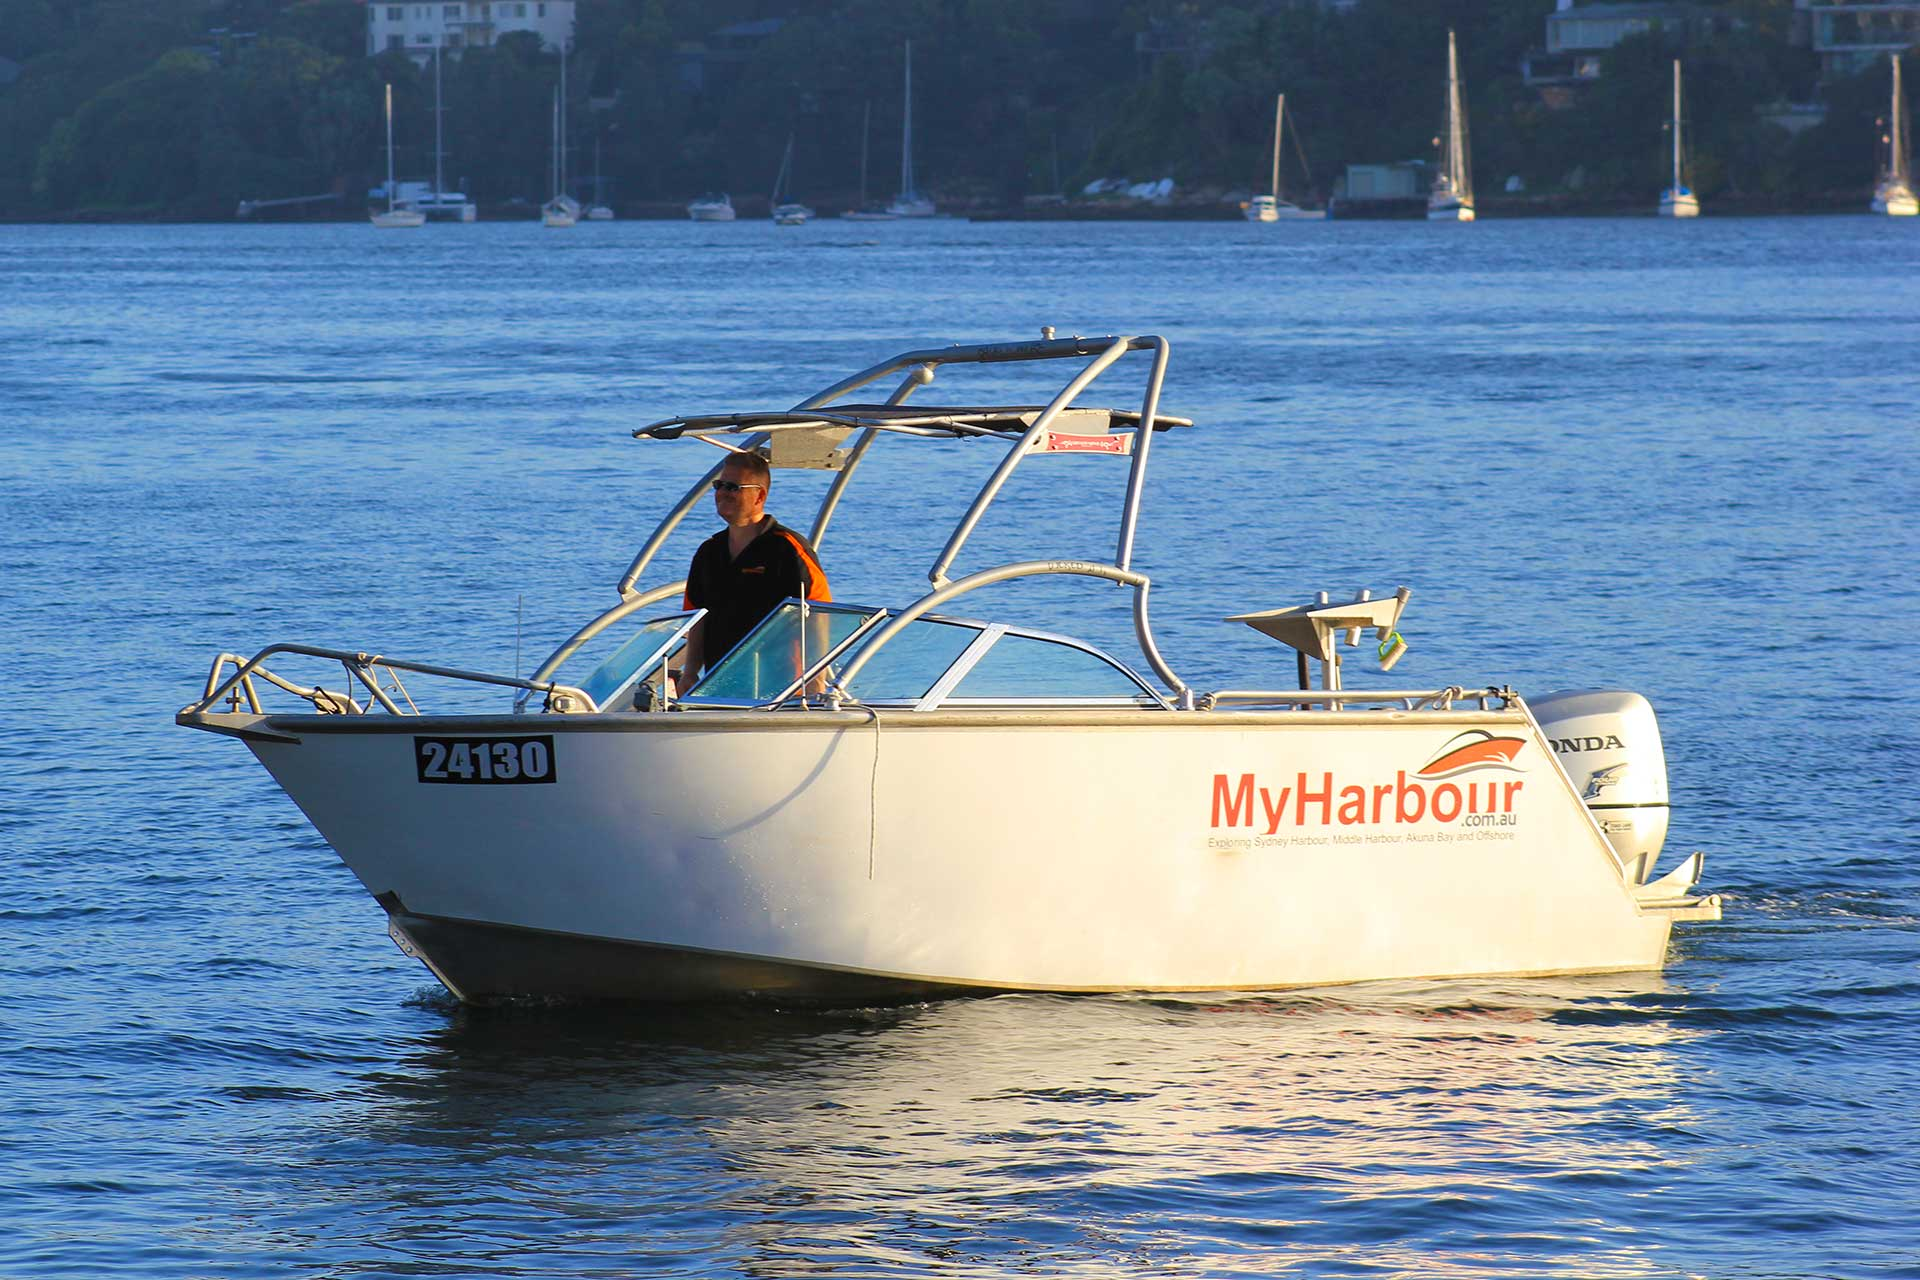 SportsRider-Sydney-MyHarbour